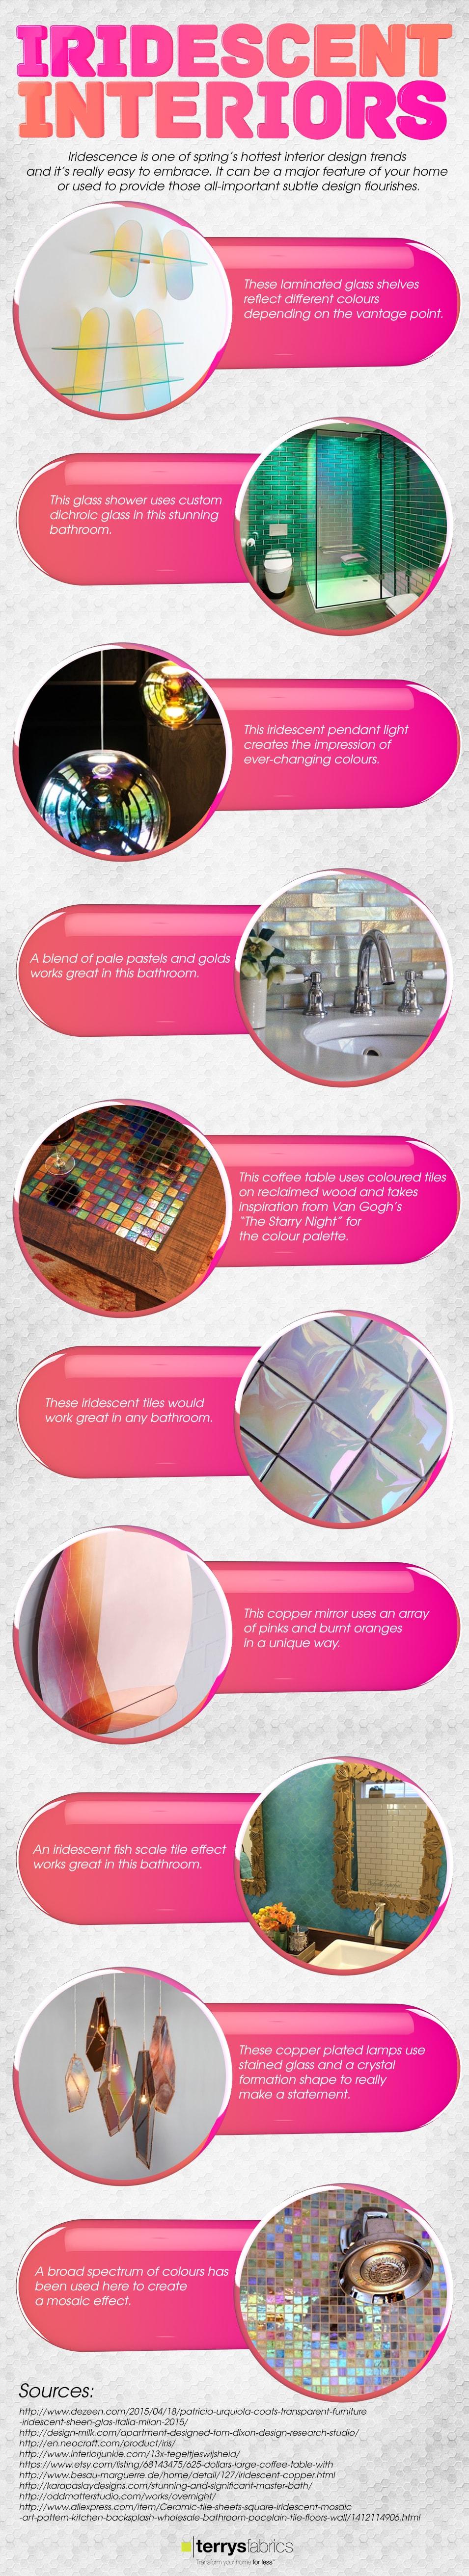 Iridescent Interiors [Infographic]